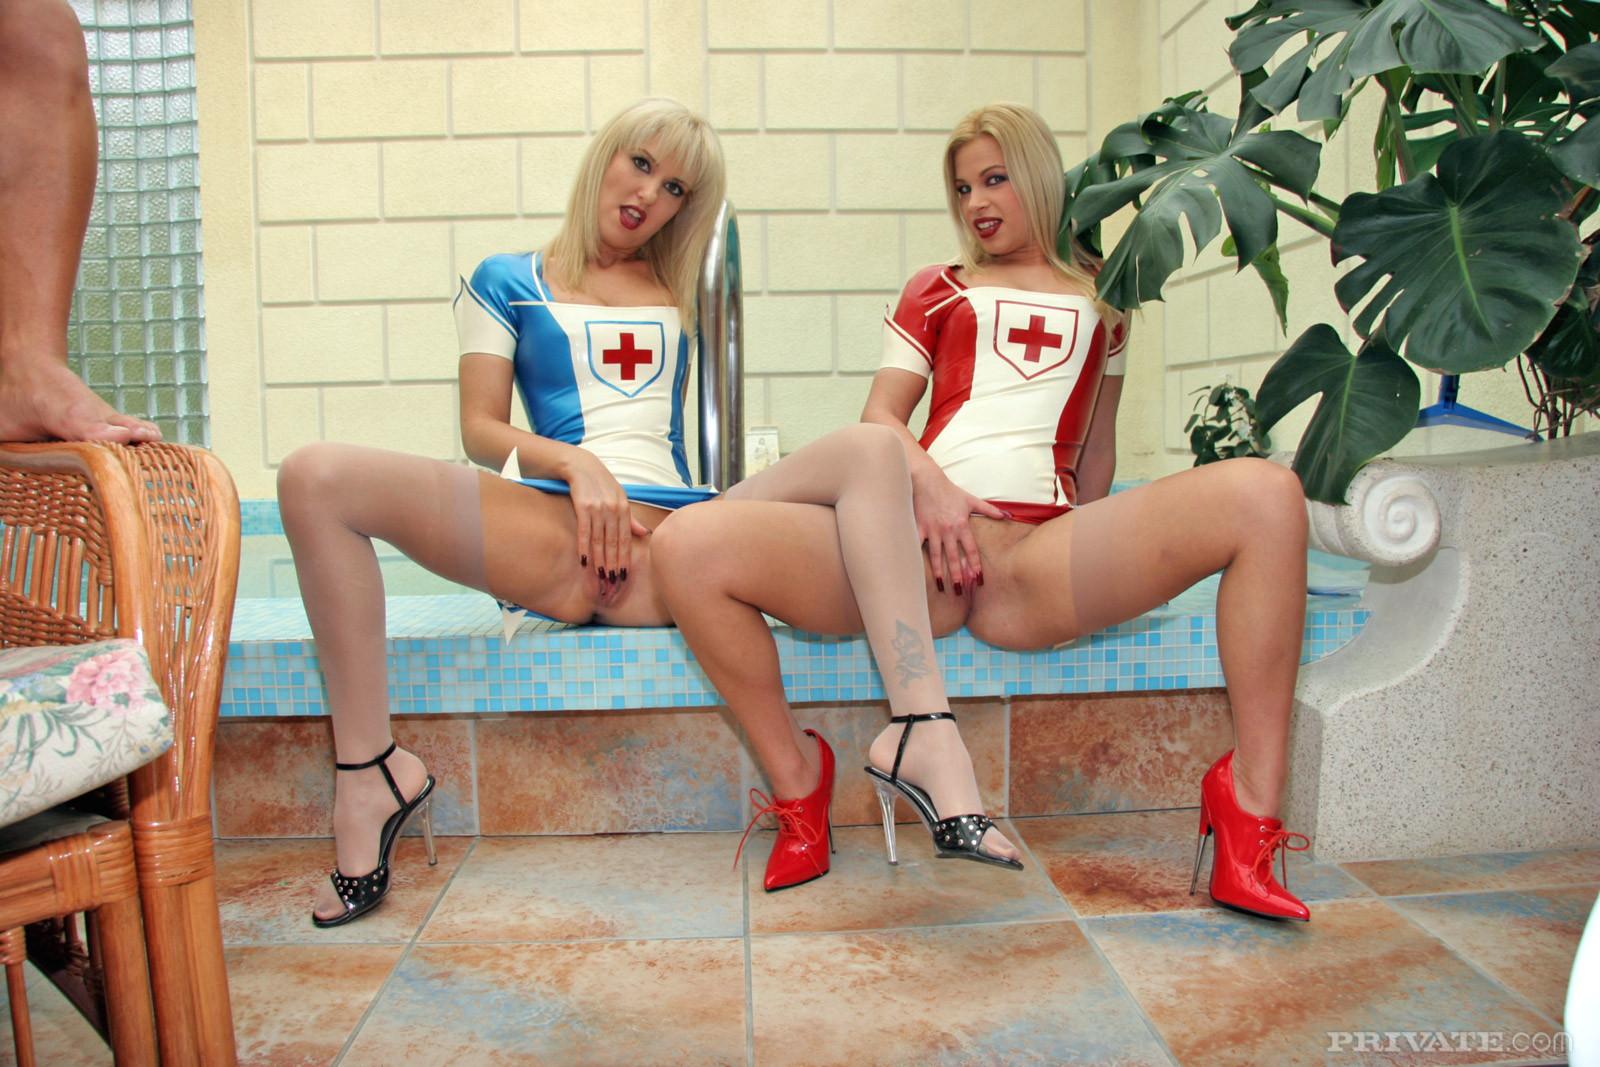 Simony Diamond, Jessica Girl, Tira, Crystal Crown, Denys Cult - Медсестра - Галерея № 3474335